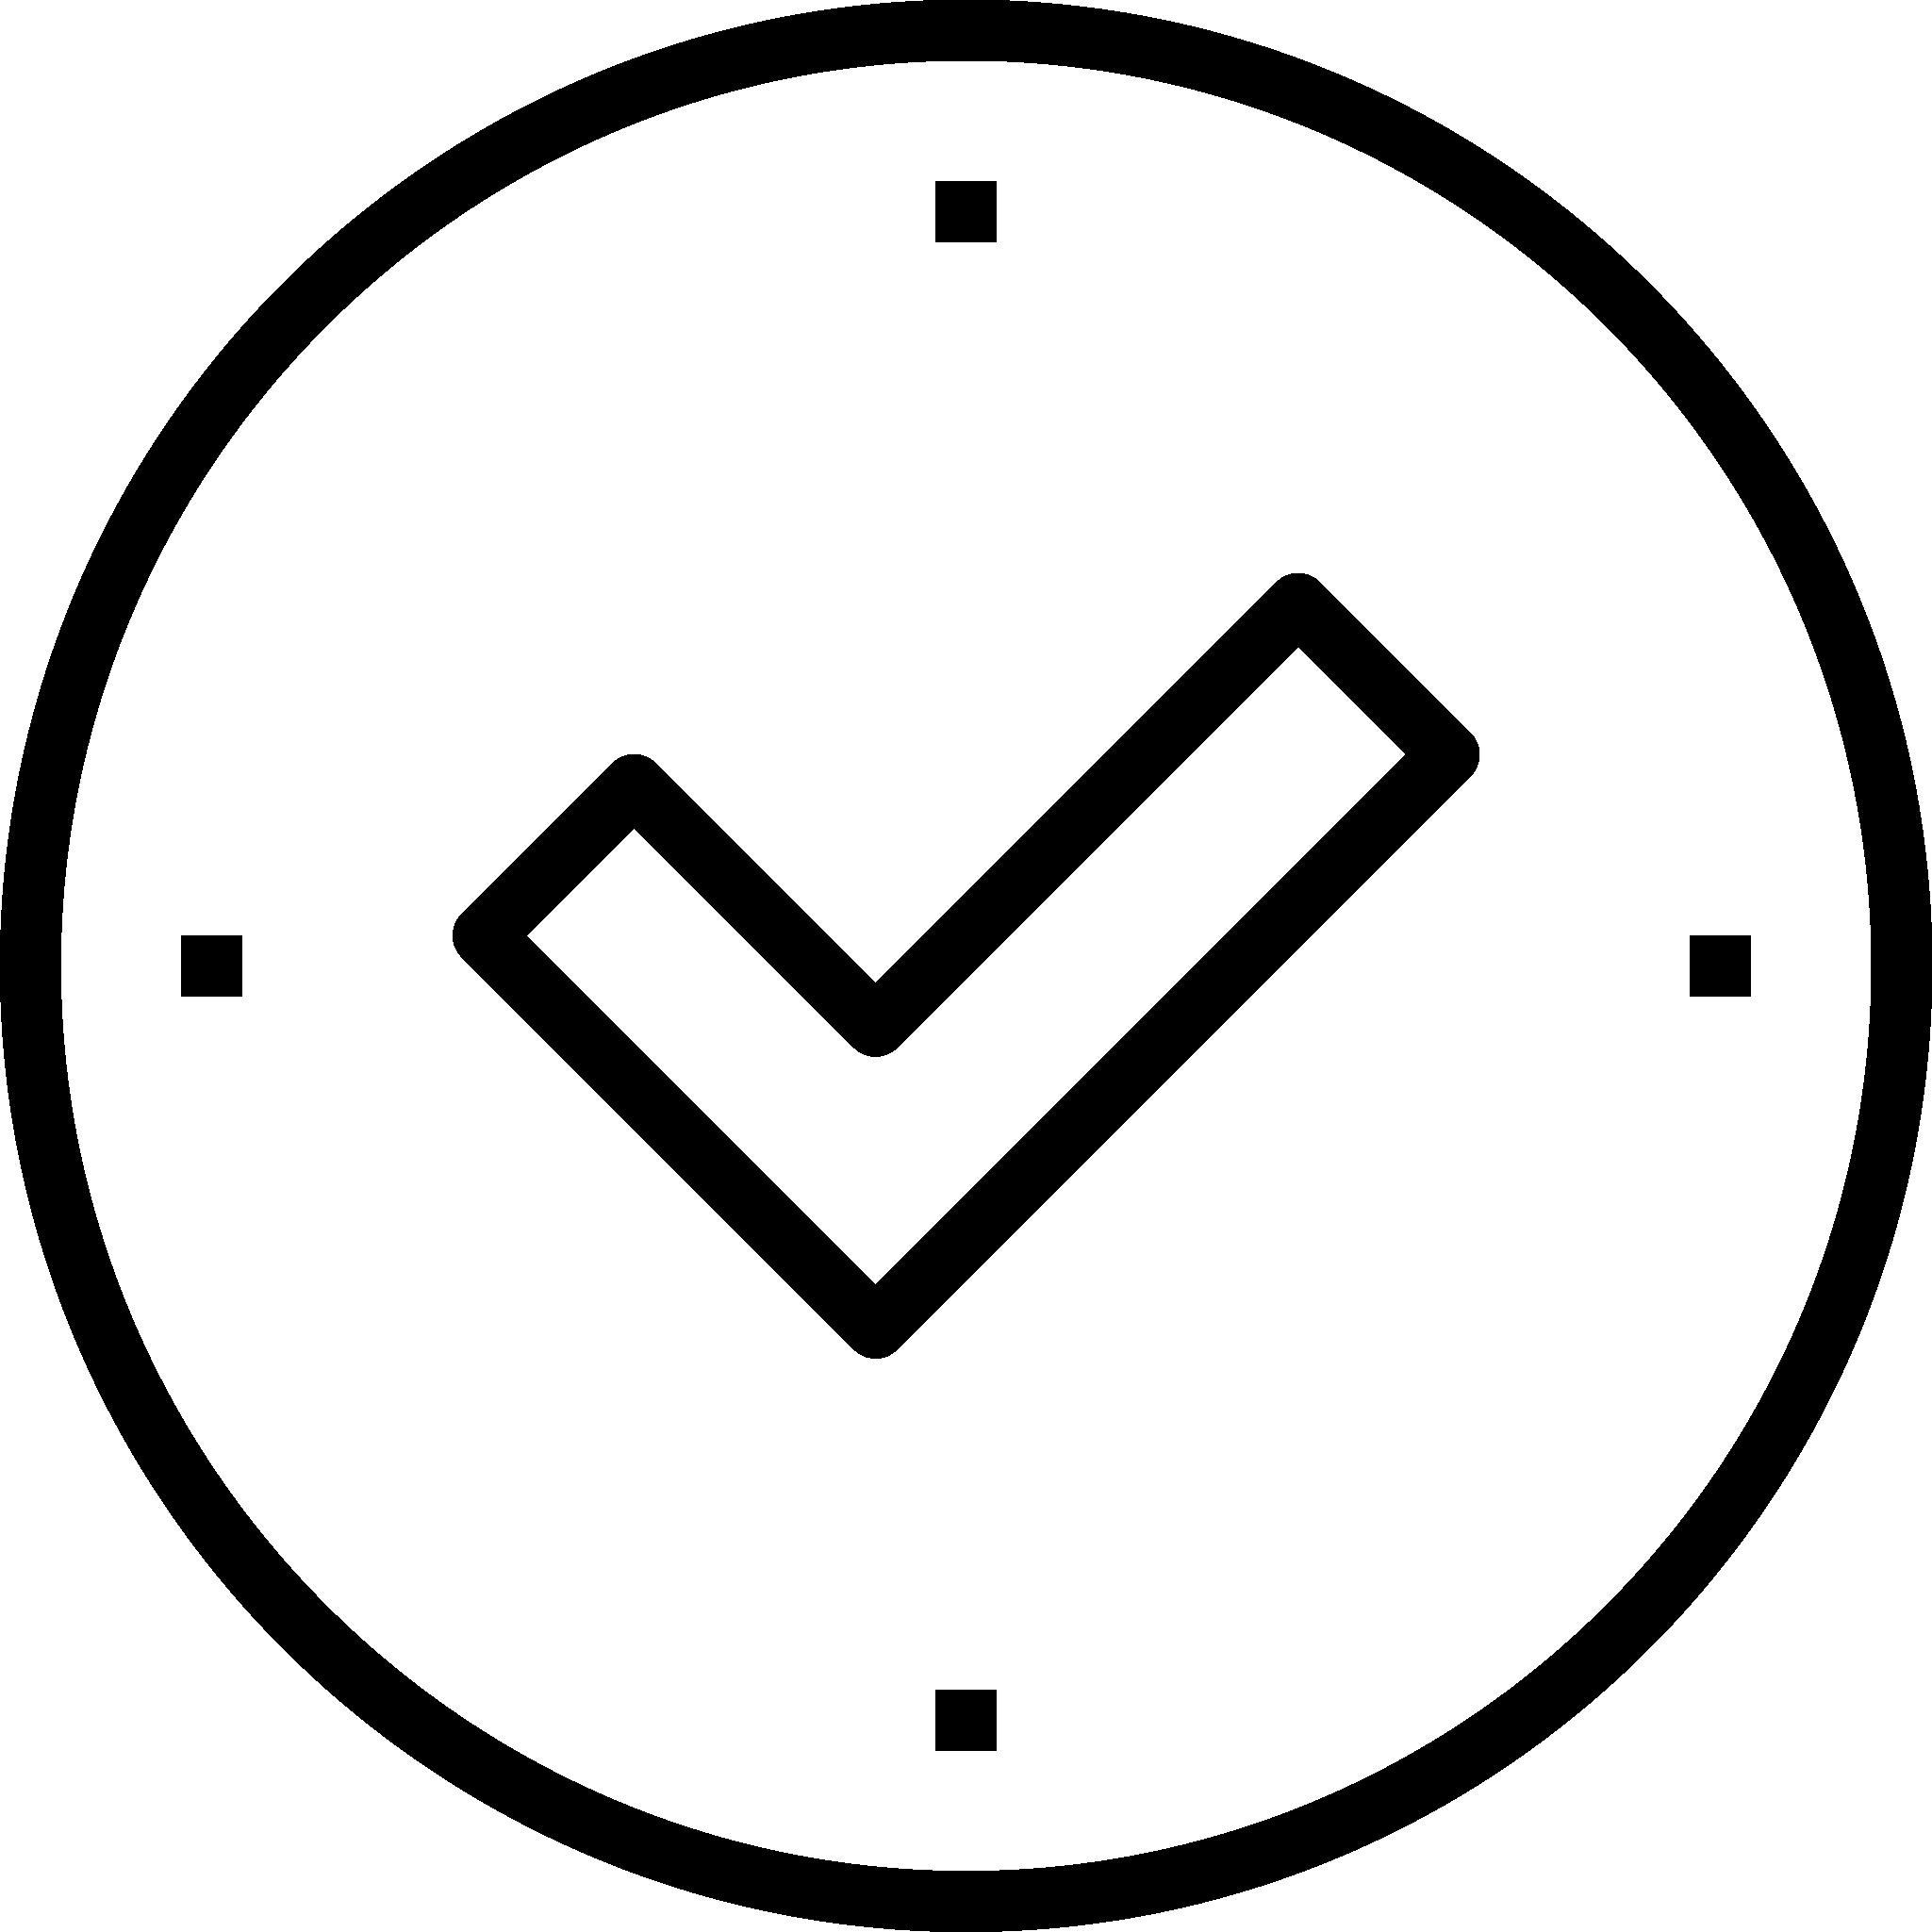 edr3-remediate